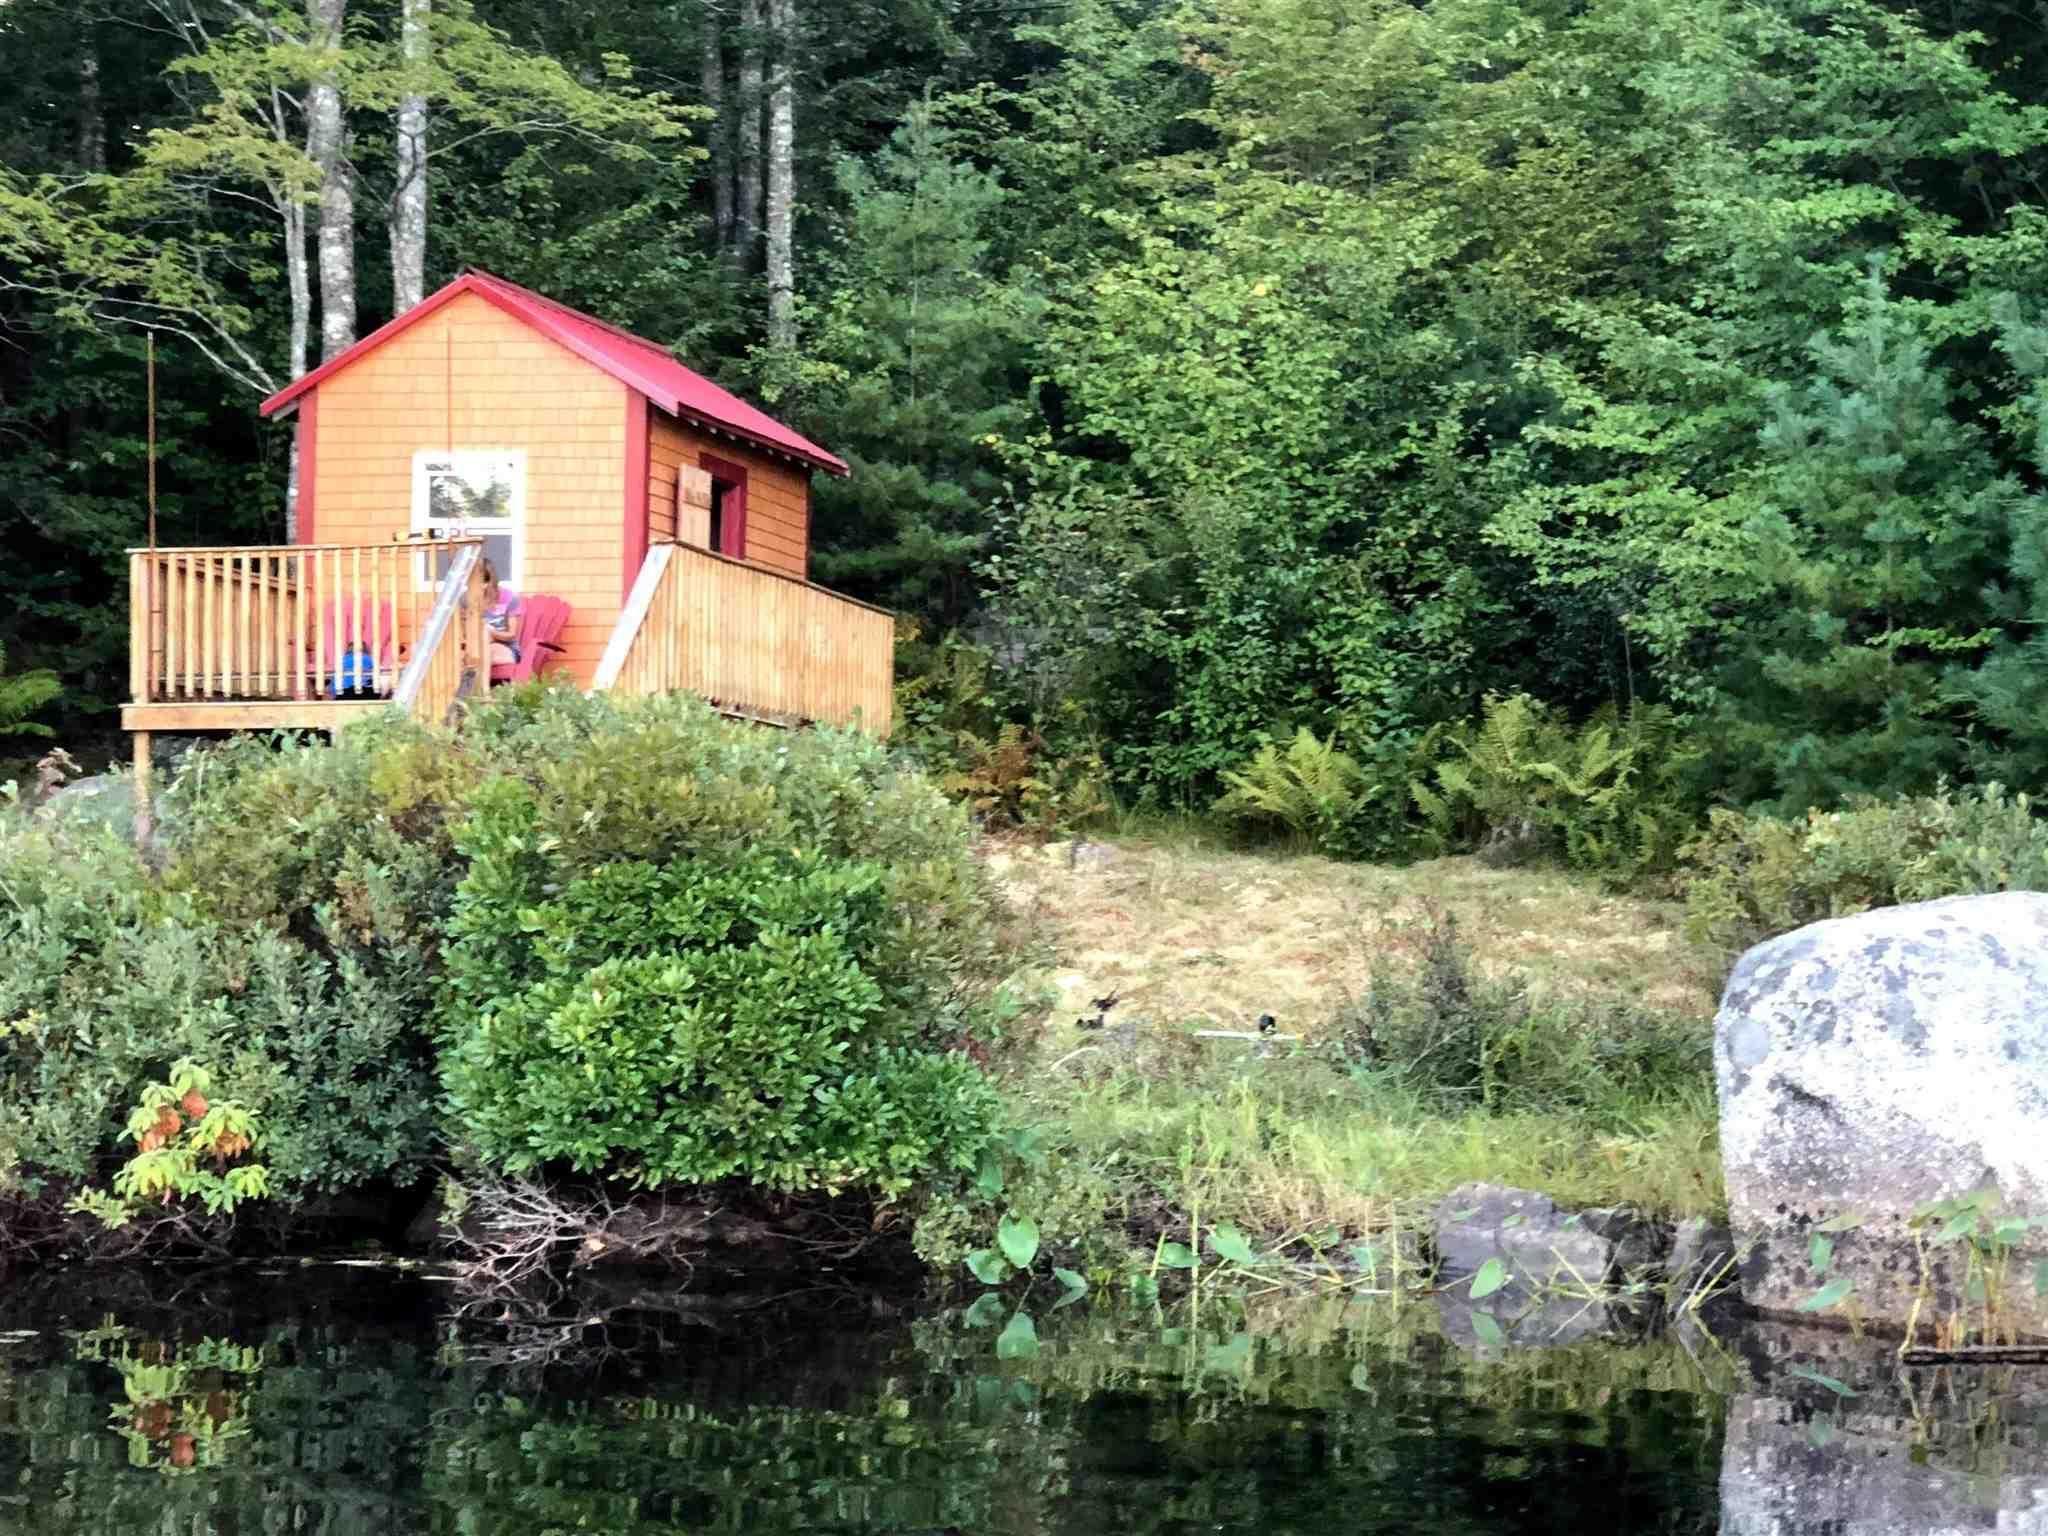 Main Photo: 628 Molega Lake Road in Molega Lake: 405-Lunenburg County Residential for sale (South Shore)  : MLS®# 202120483